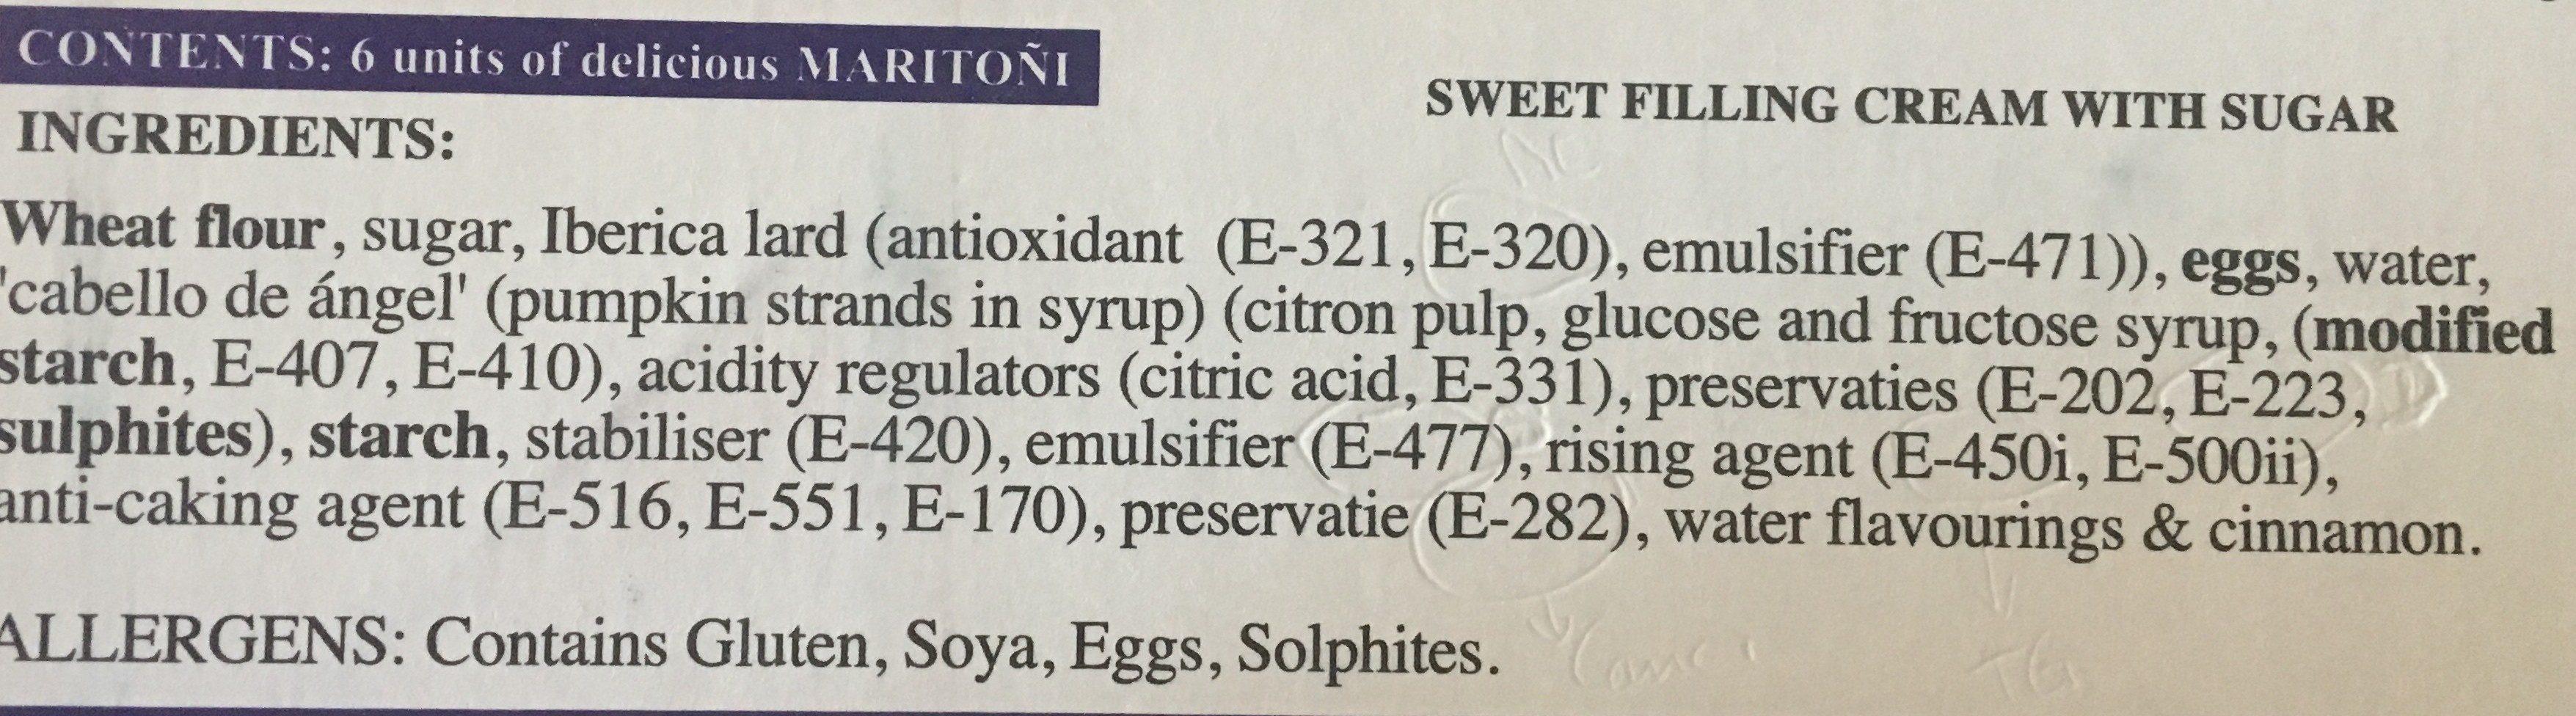 Tortas 6 unidades envase 740 g - Ingredientes